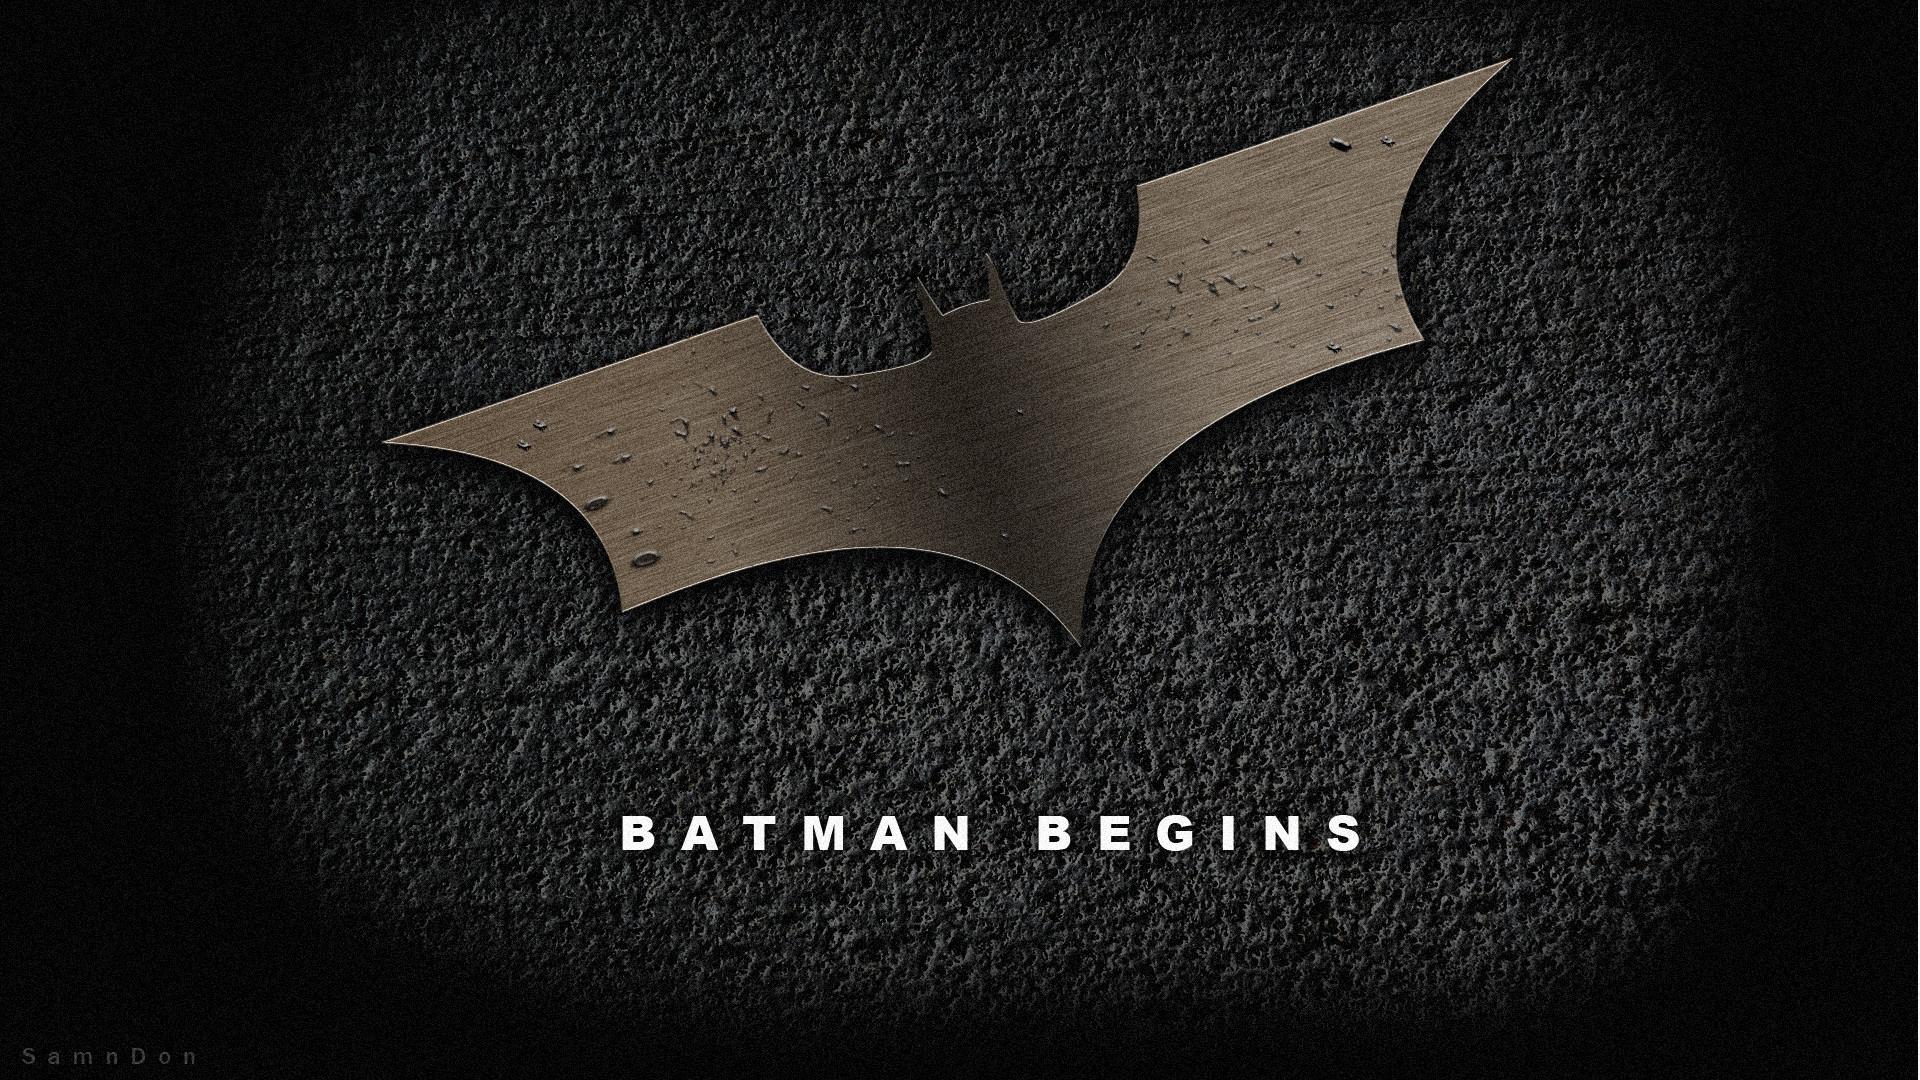 batman_begins_wallpaper_by_samndon-d5ibfj0